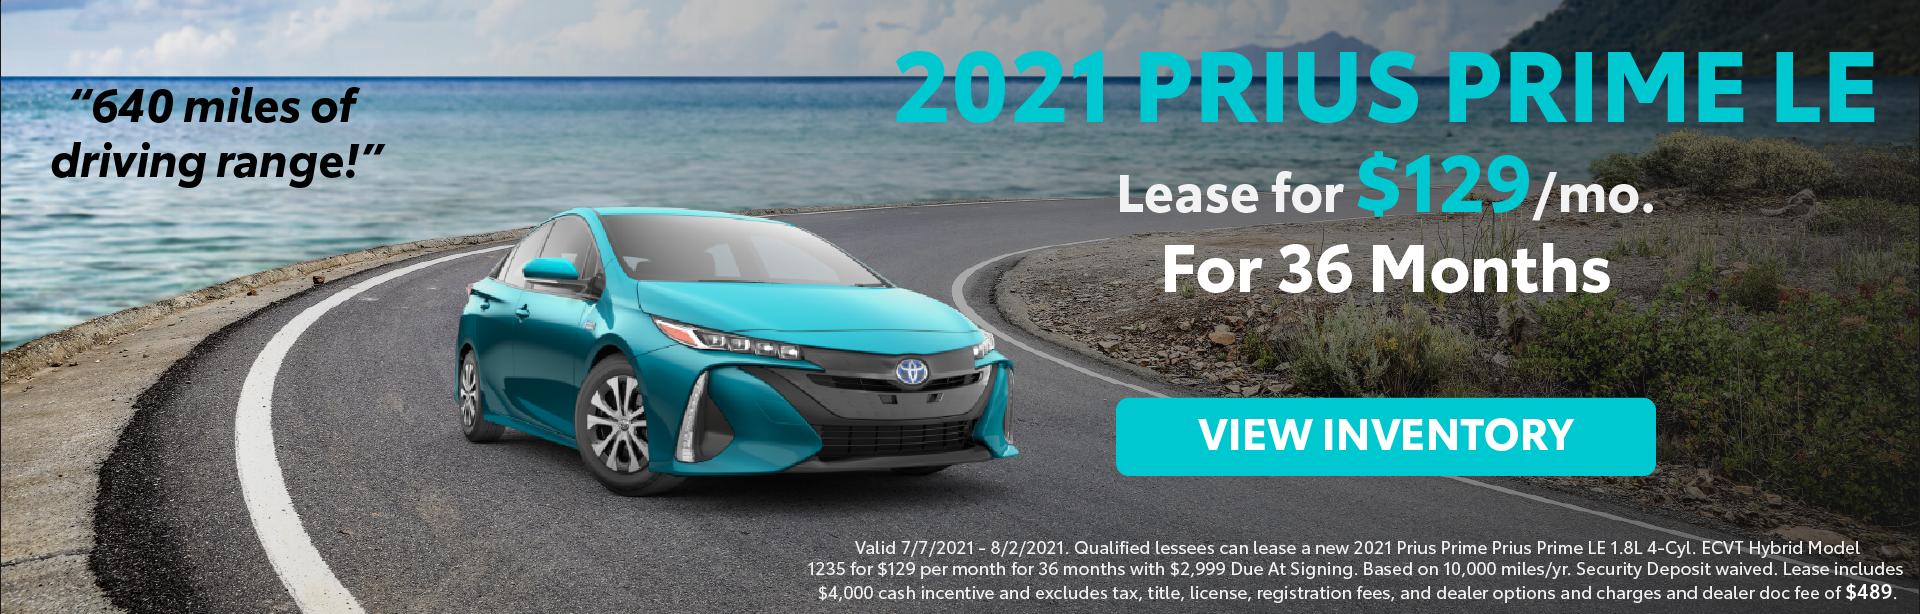 Prius Prime Lease Offer2